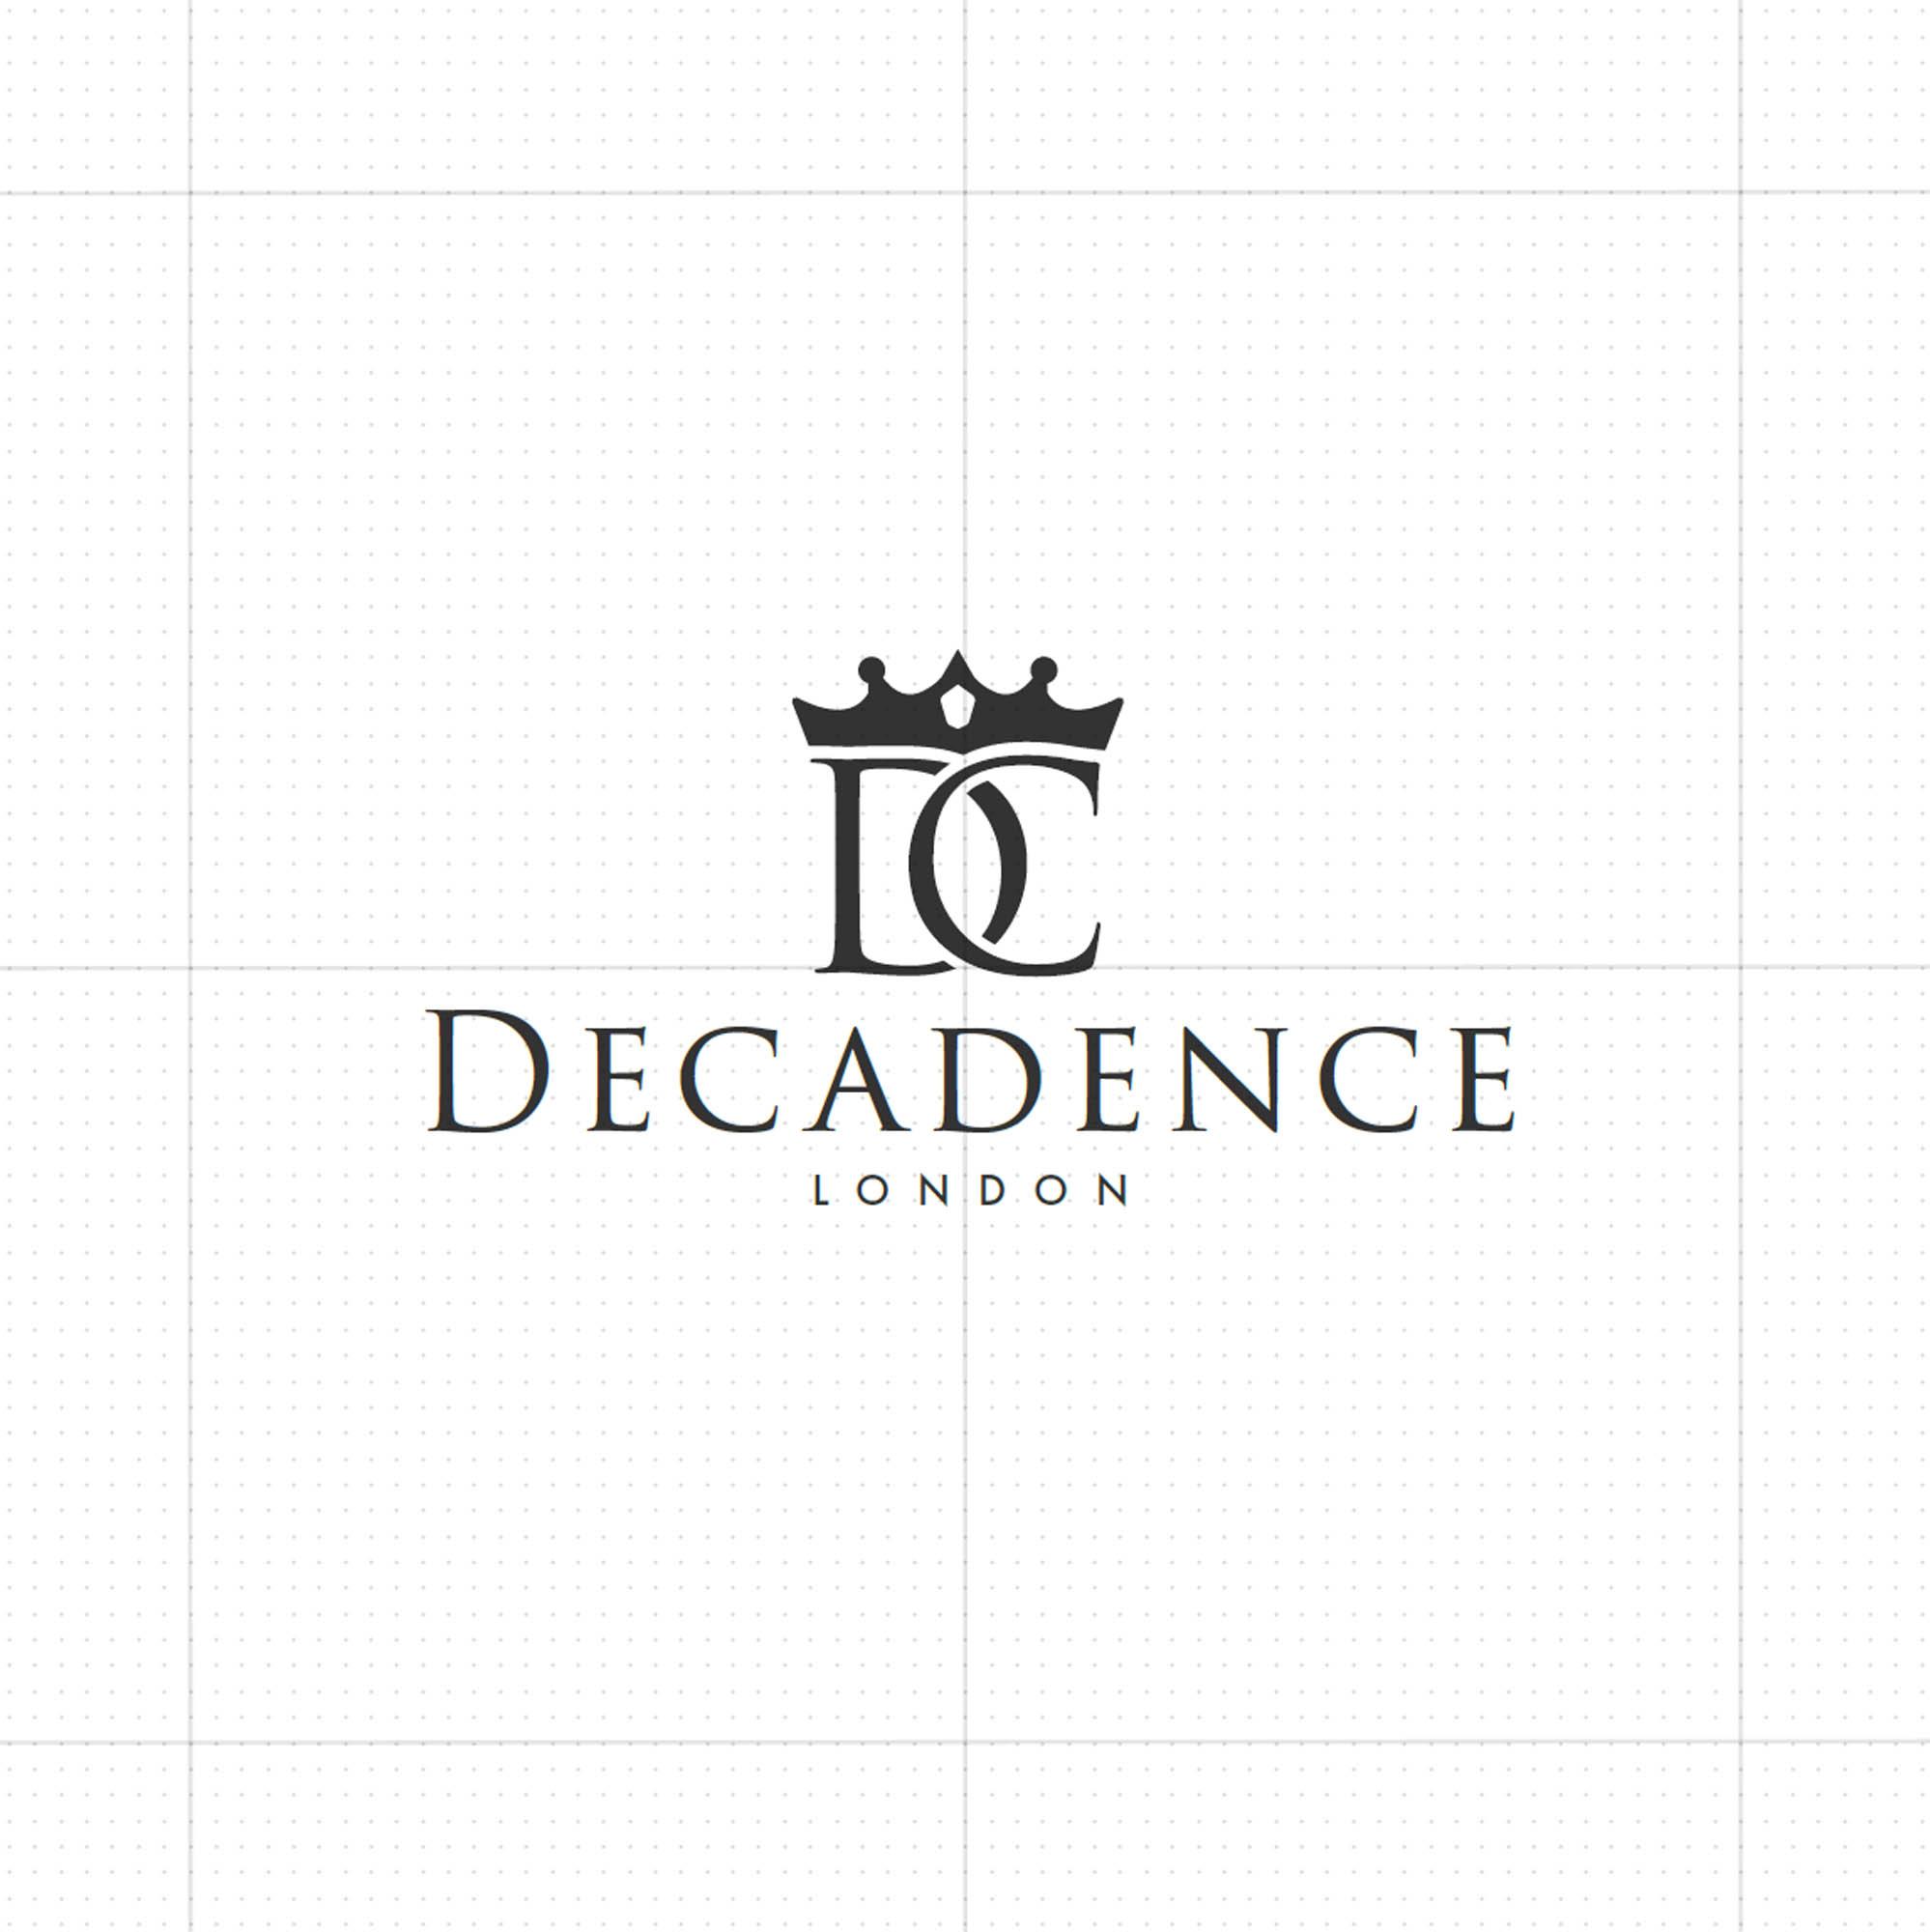 luxury-high-end-clothing-brand-logo-design-london08